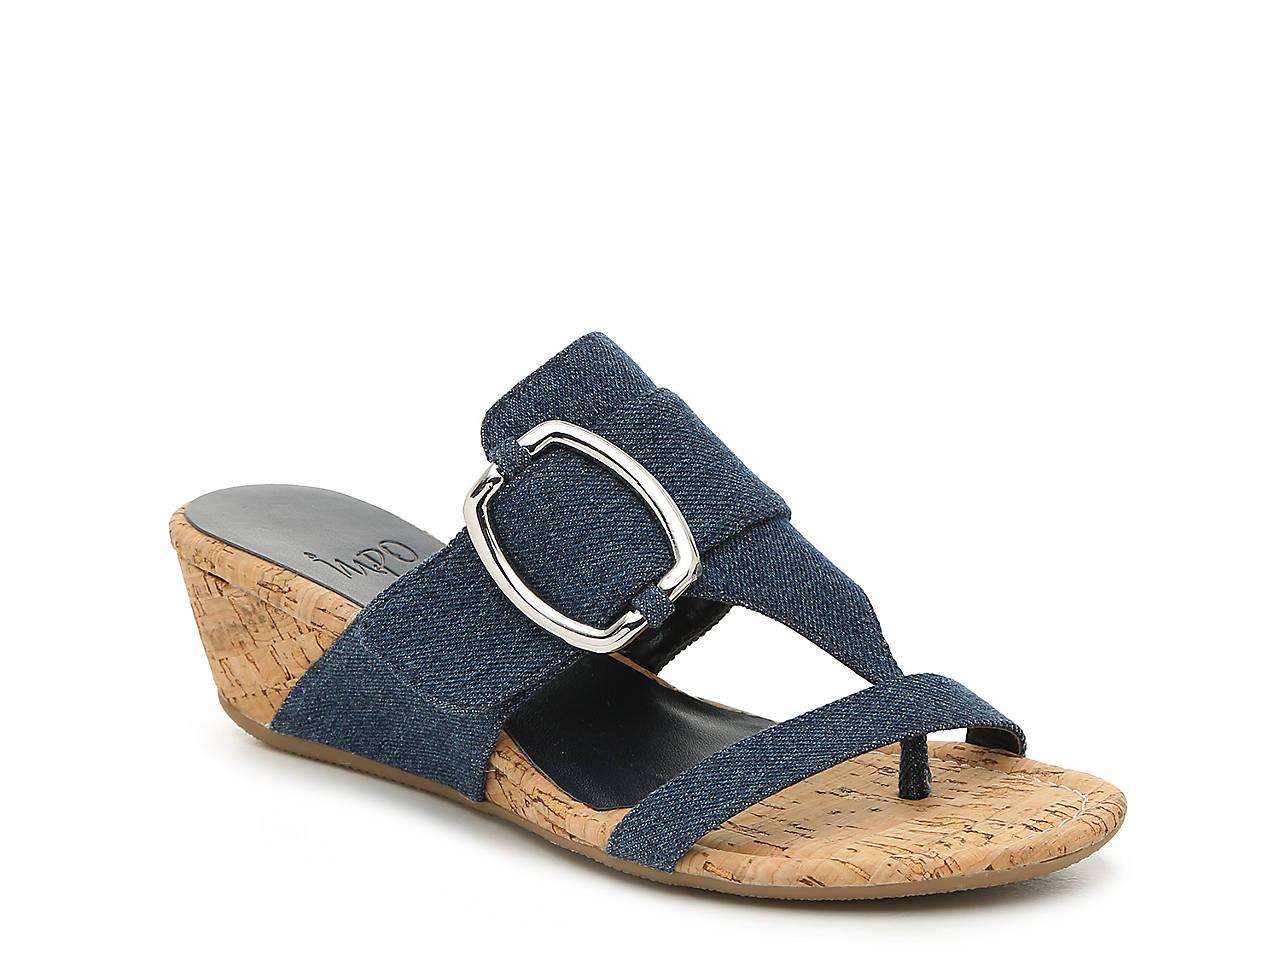 f83bb6720dbe Impo Gaelle Wedge Sandal Women s Shoes